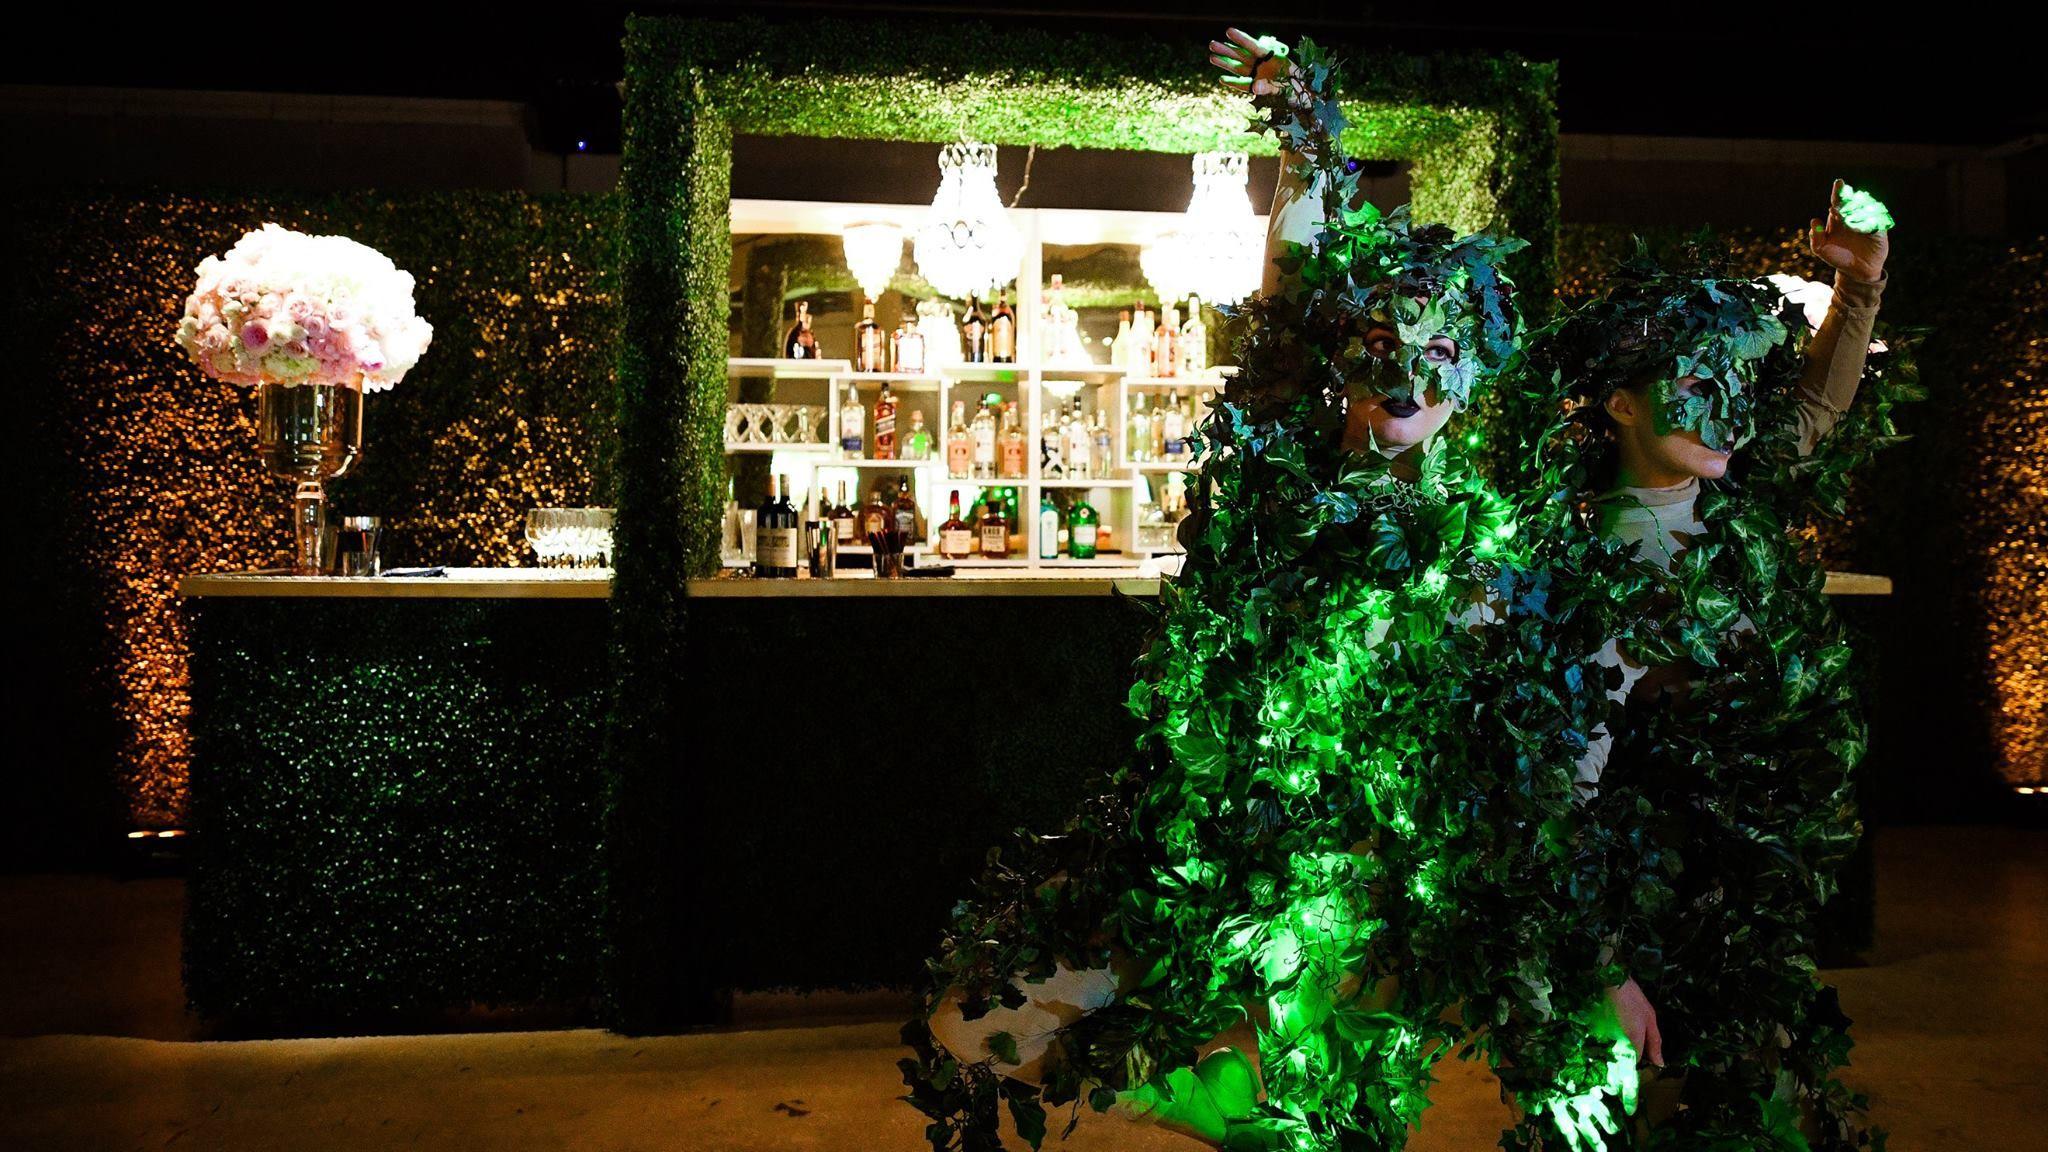 Garden event decor  Extravagant Masquerade Bat Mitzvah Photography at Gallery of Amazing